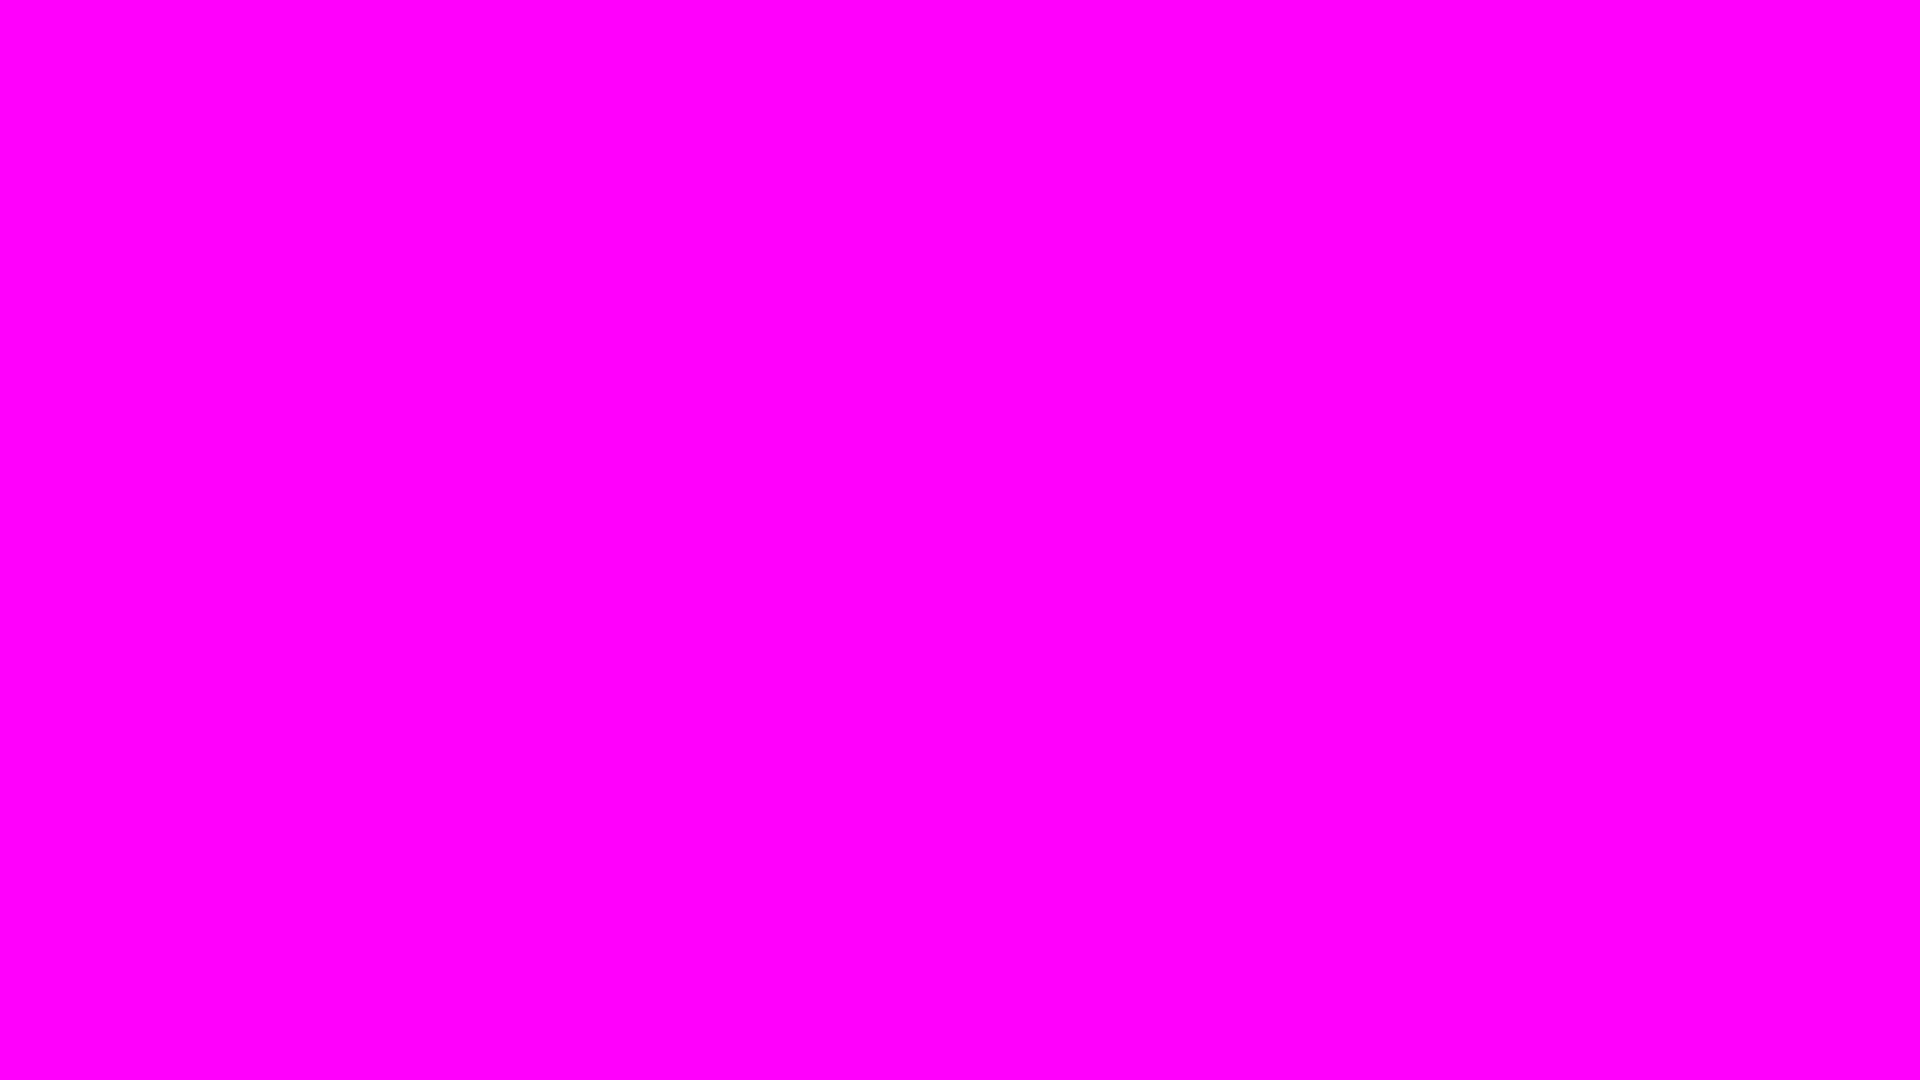 1920x1080 Magenta Solid Color Background